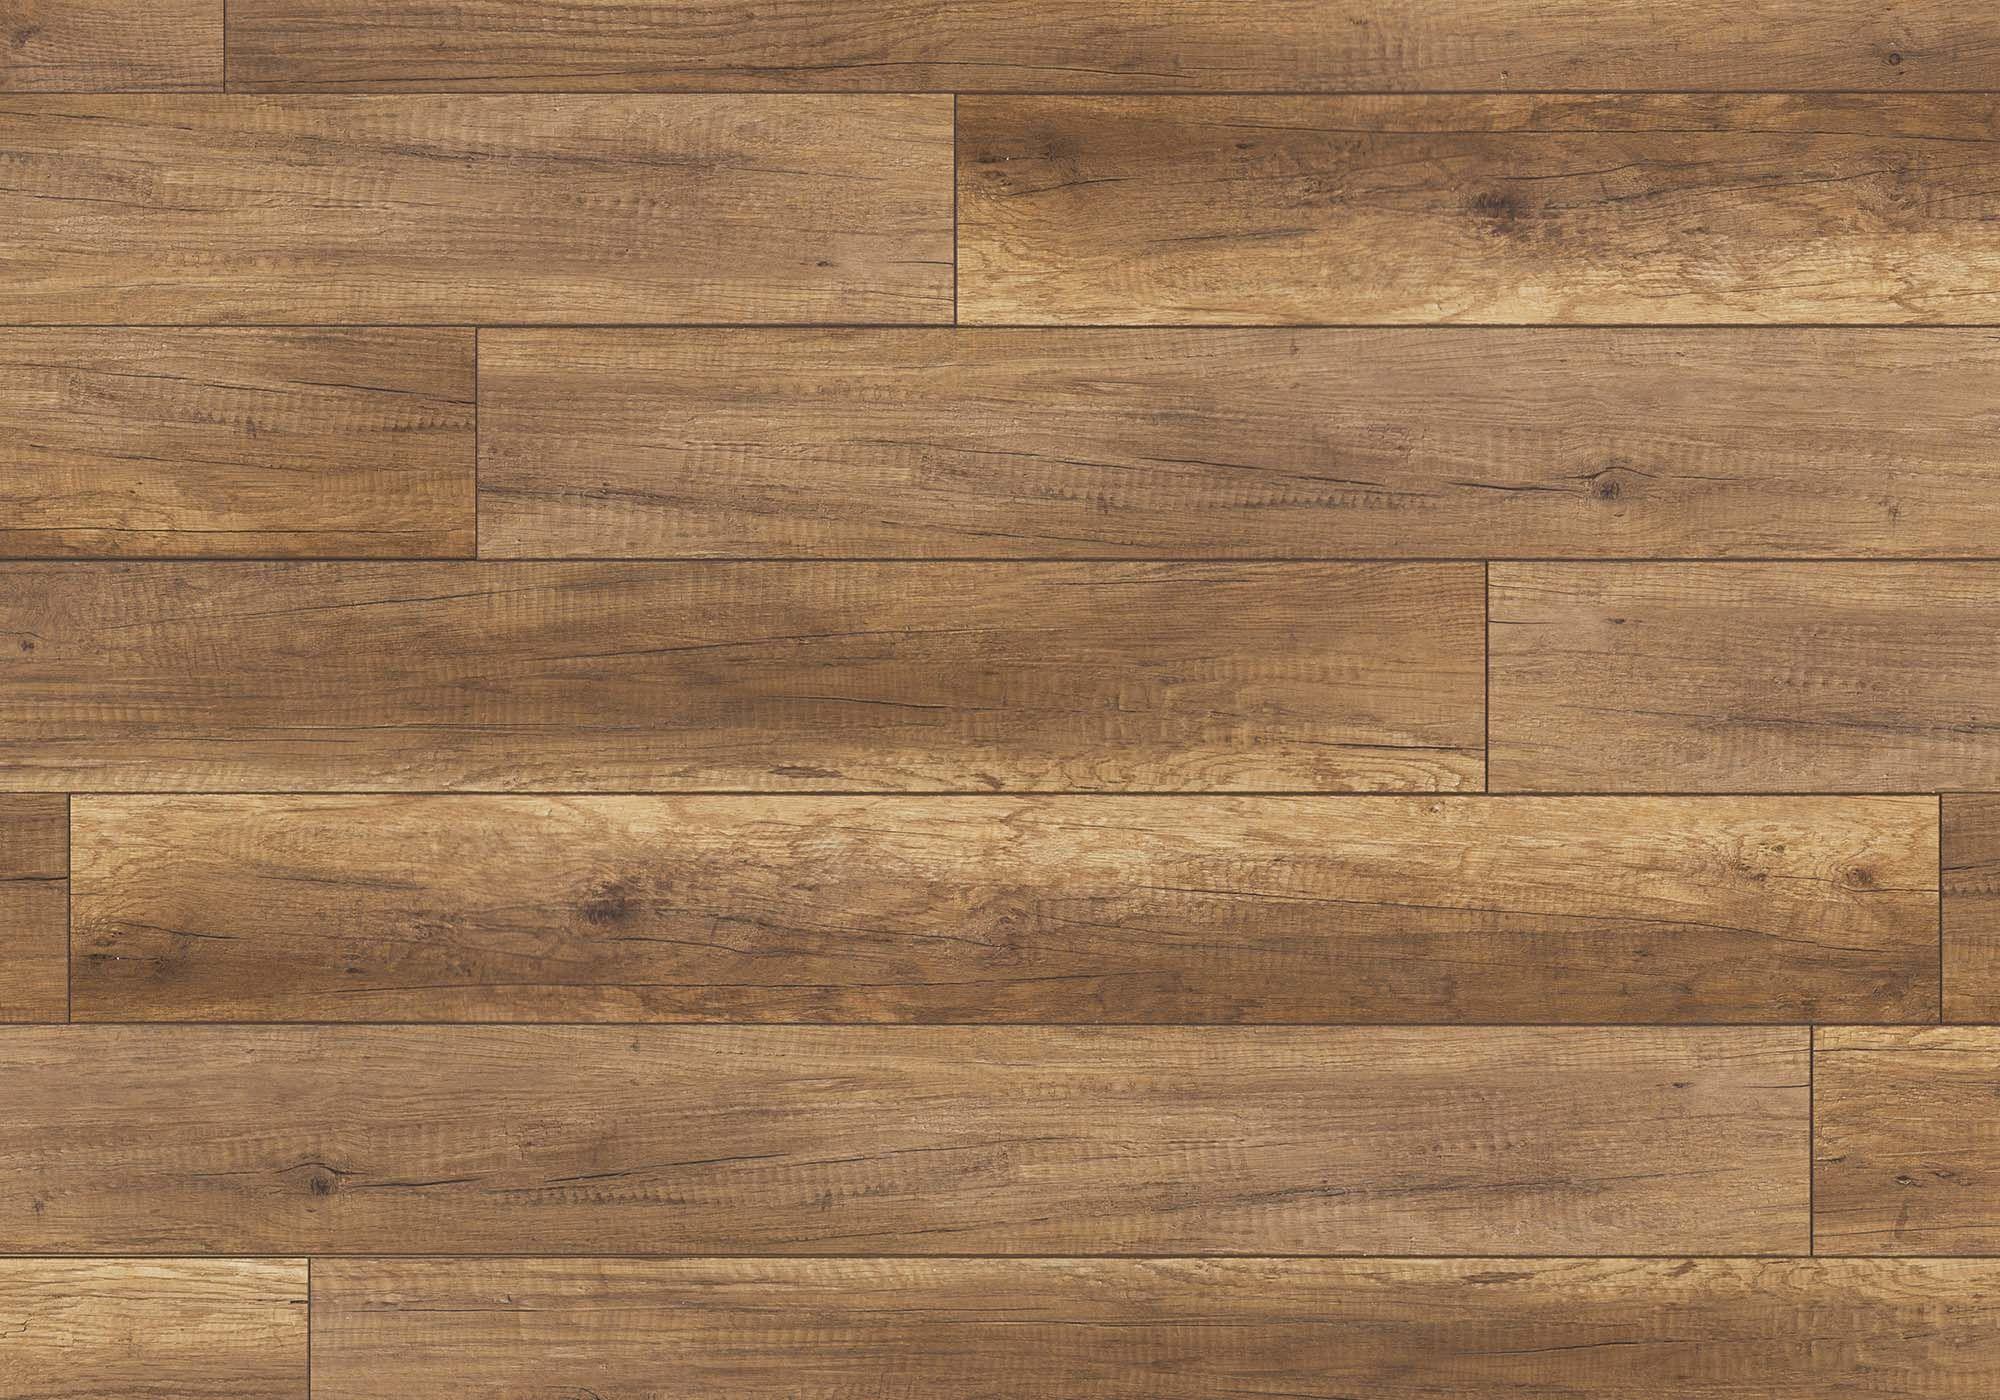 Hillside Precious Highlandscollection 35717 Hillside A Rustic Medium Brown Plank Is Part Of The Precious Highlands Collection Flooring Brown Wood Wood Floors